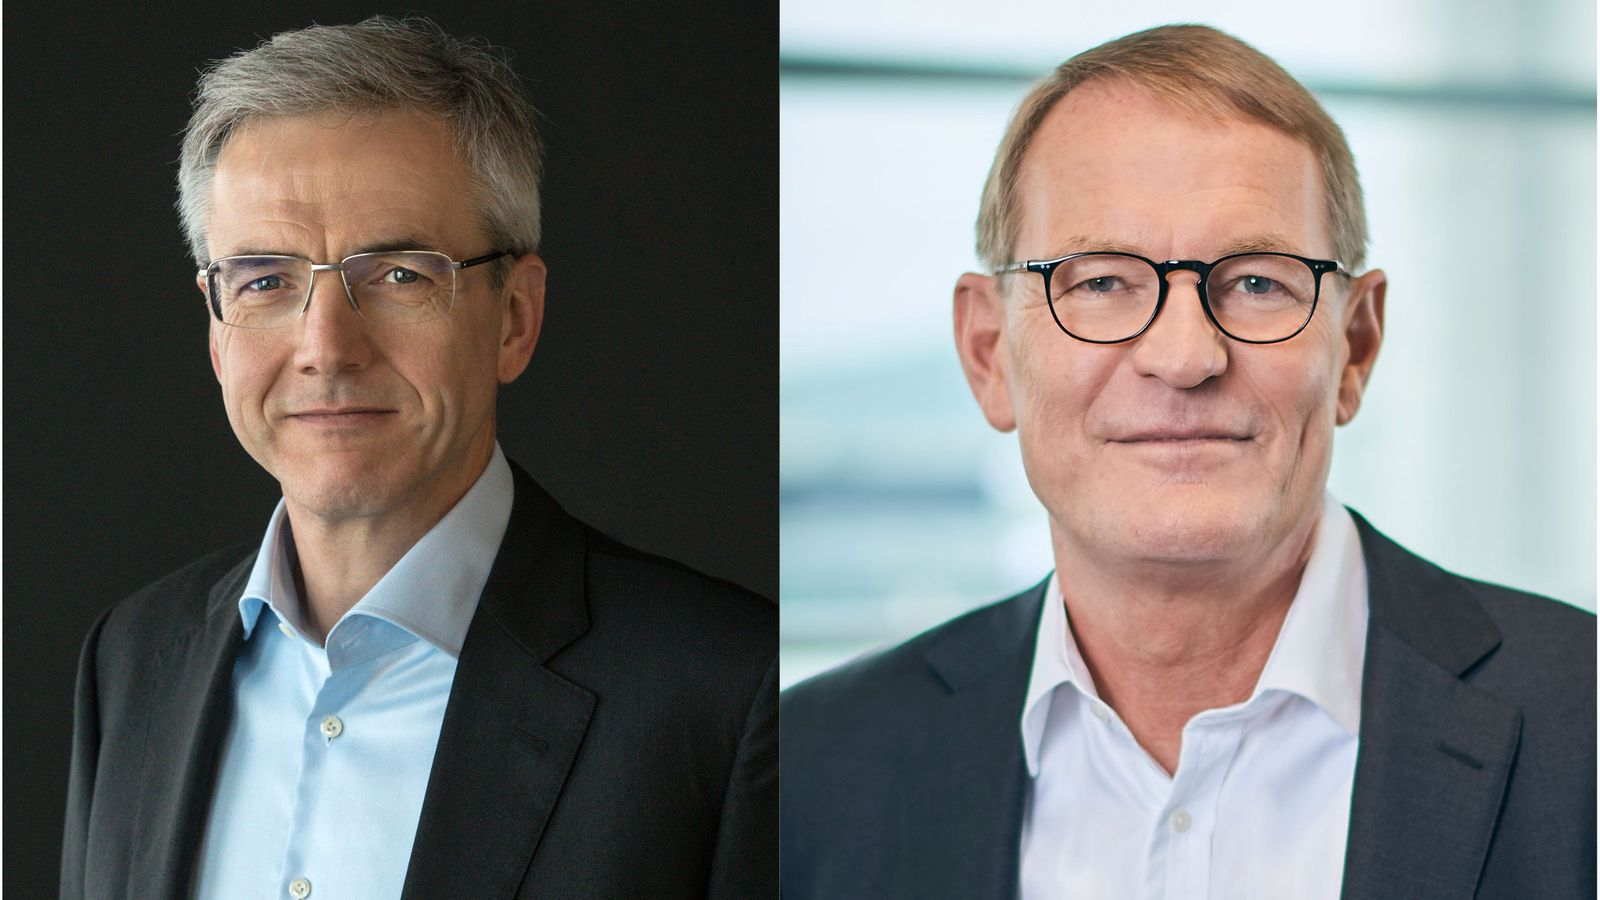 Führungswechsel bei der Daimler Truck AG